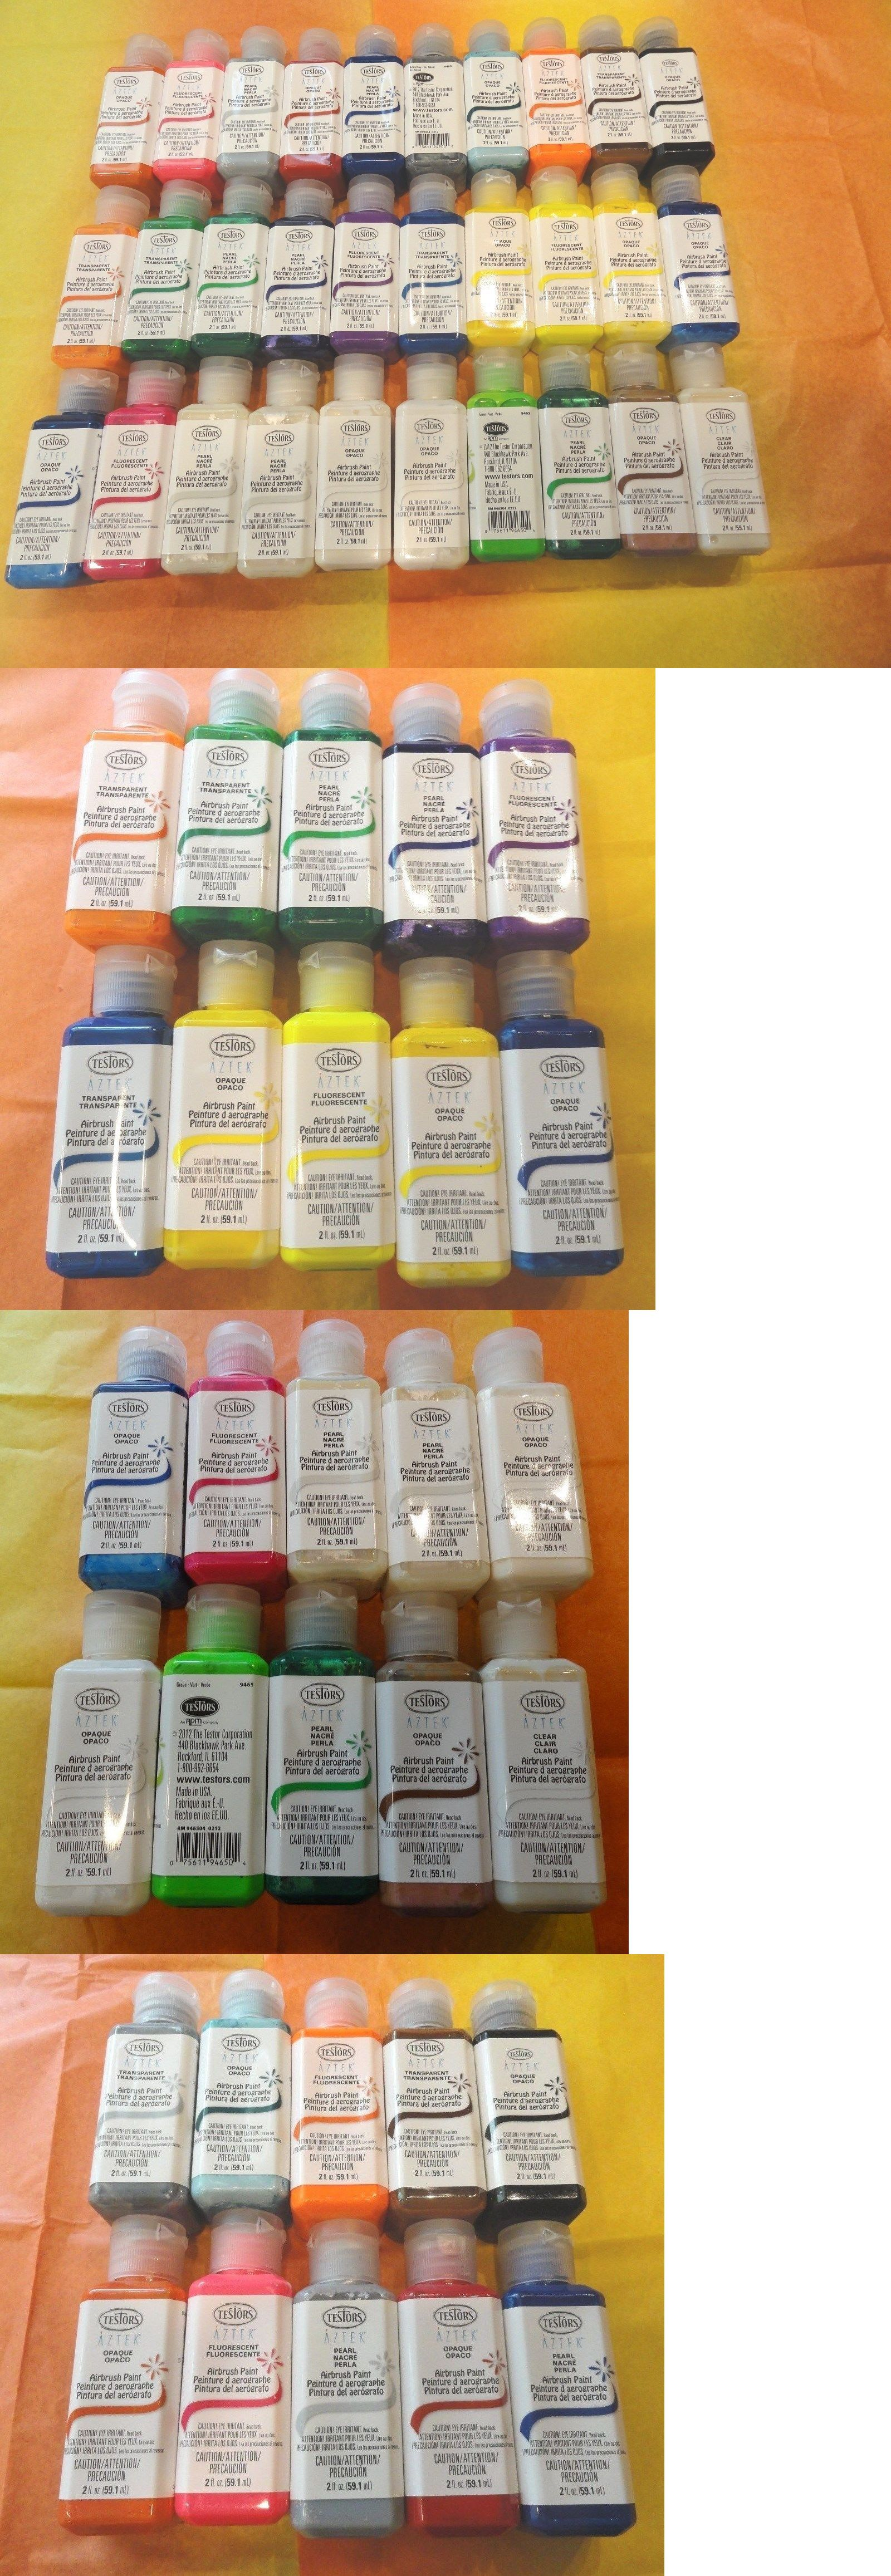 Airbrush Paints 183092: 30 Bottles Of Testors Aztek Airbrush